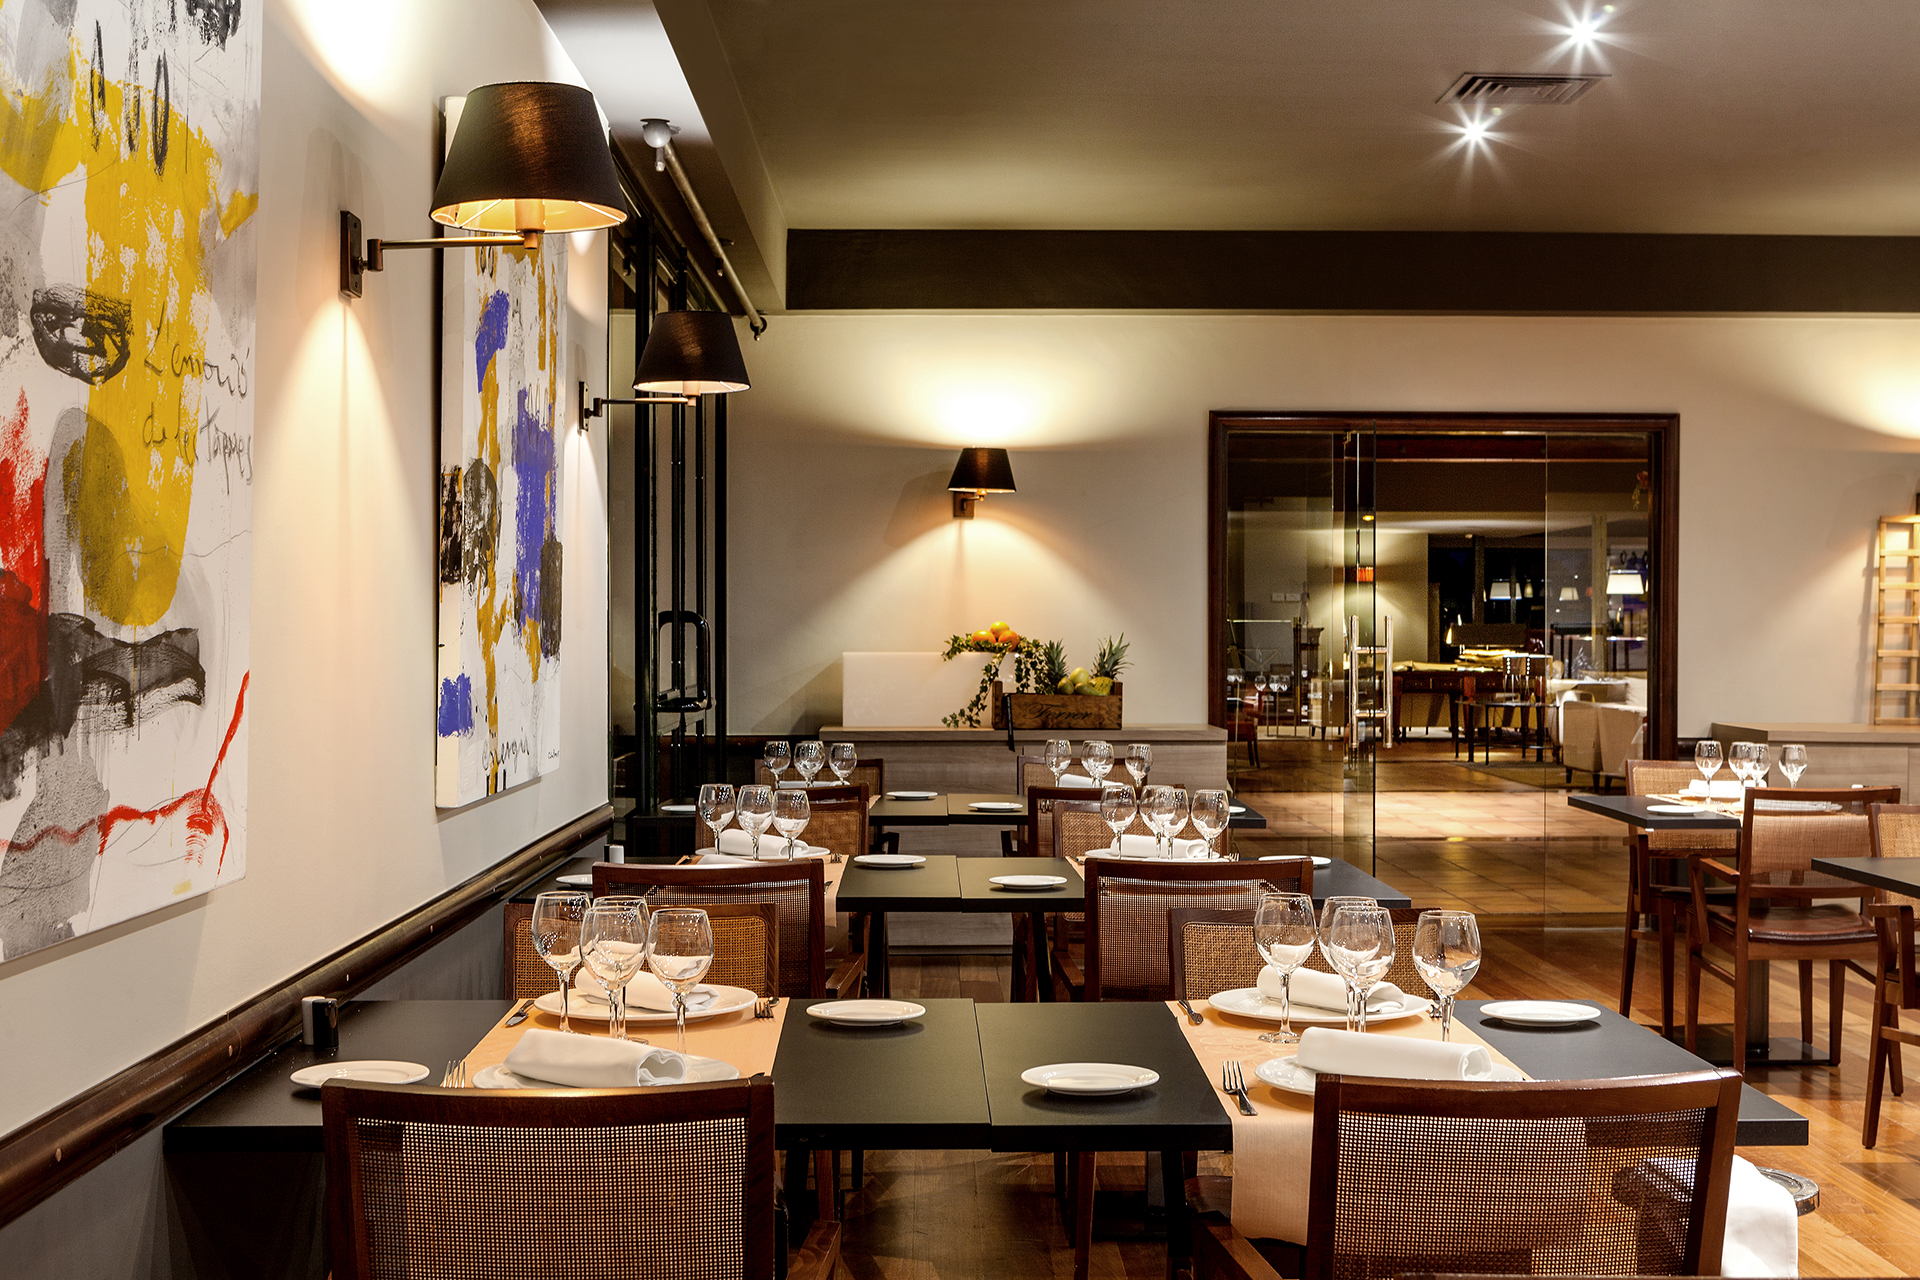 Golf-Expedition-Golf-reizen-Spanje-Regio-Barcelona-TorreMirona-Golf-&-Spa-Resort-restaurant